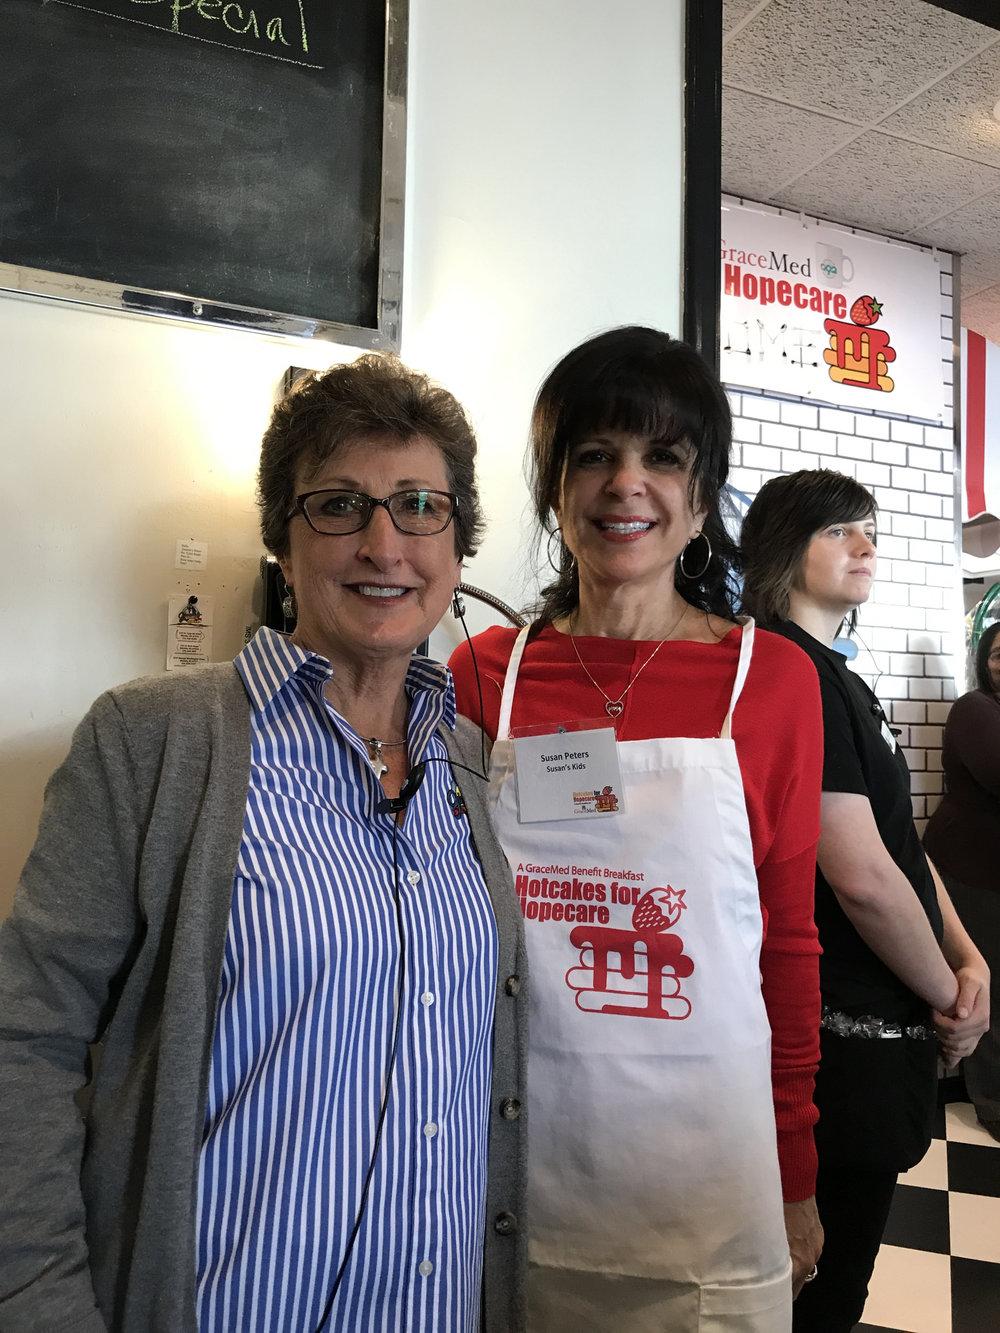 Linda Davidson, owner of Jimmie's Diner, with Susan Peters